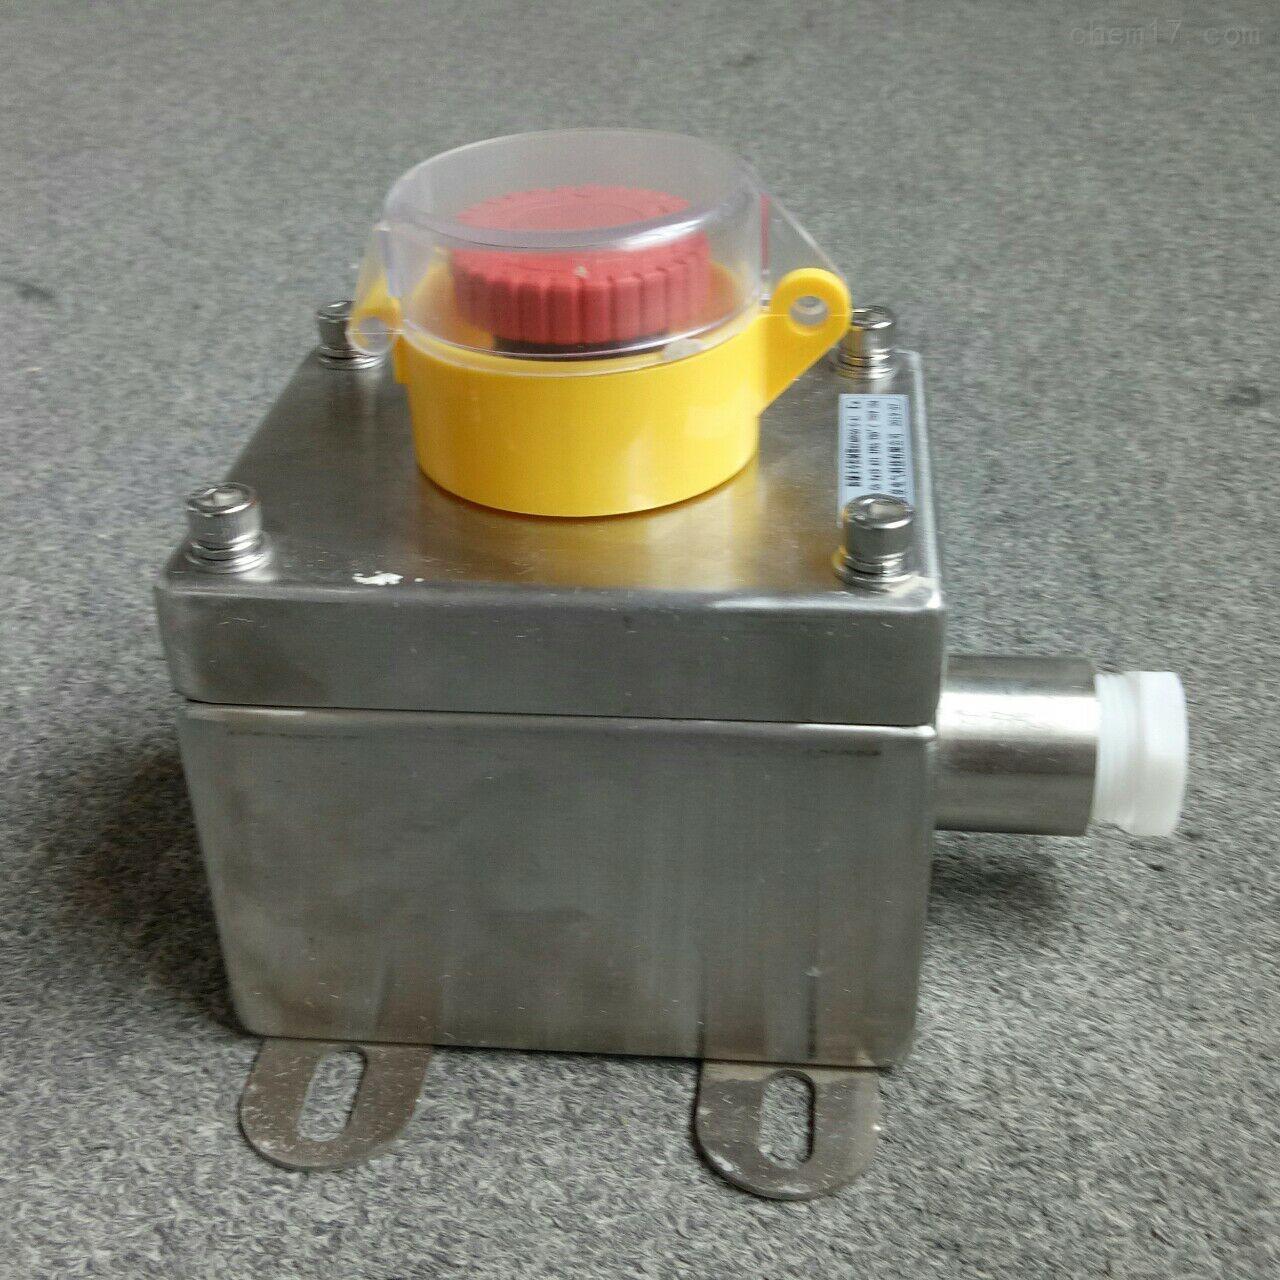 BZA8050-G-A1风机急停自锁防爆蘑菇头控制盒